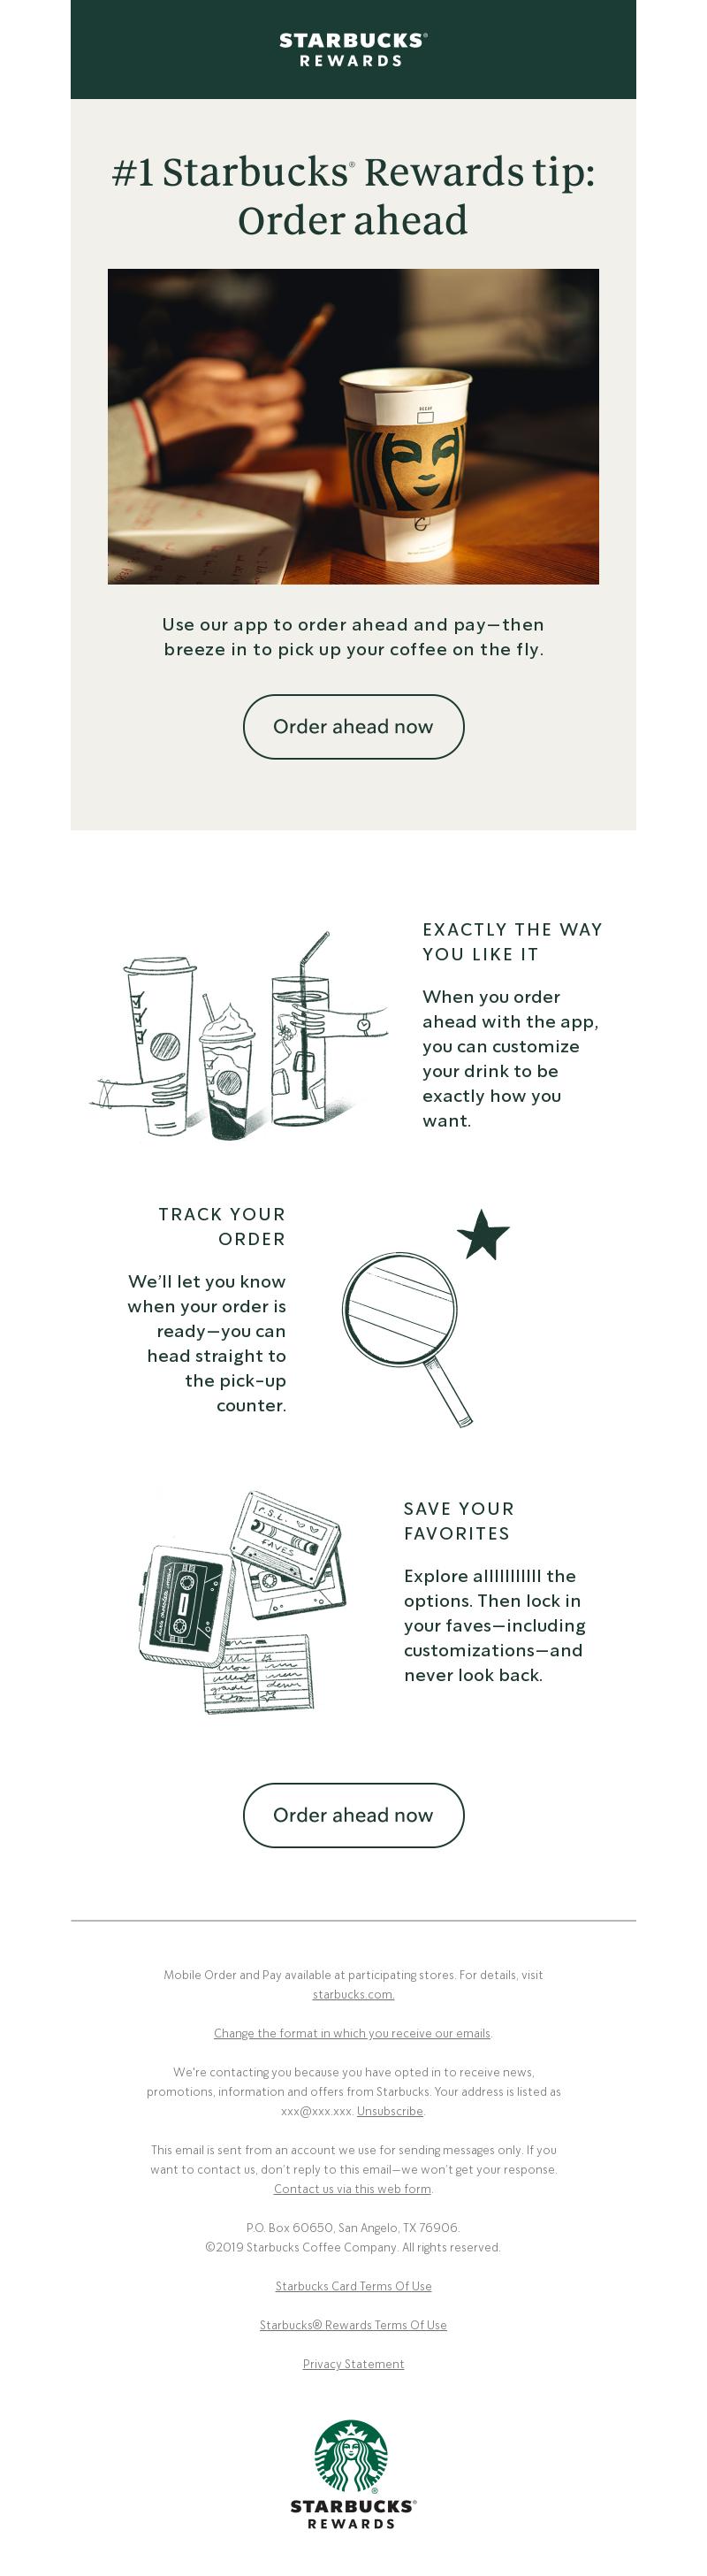 STARBUCKS® REWARDS #1 Starbucks® tip: Order ahead Use our app to order ahea